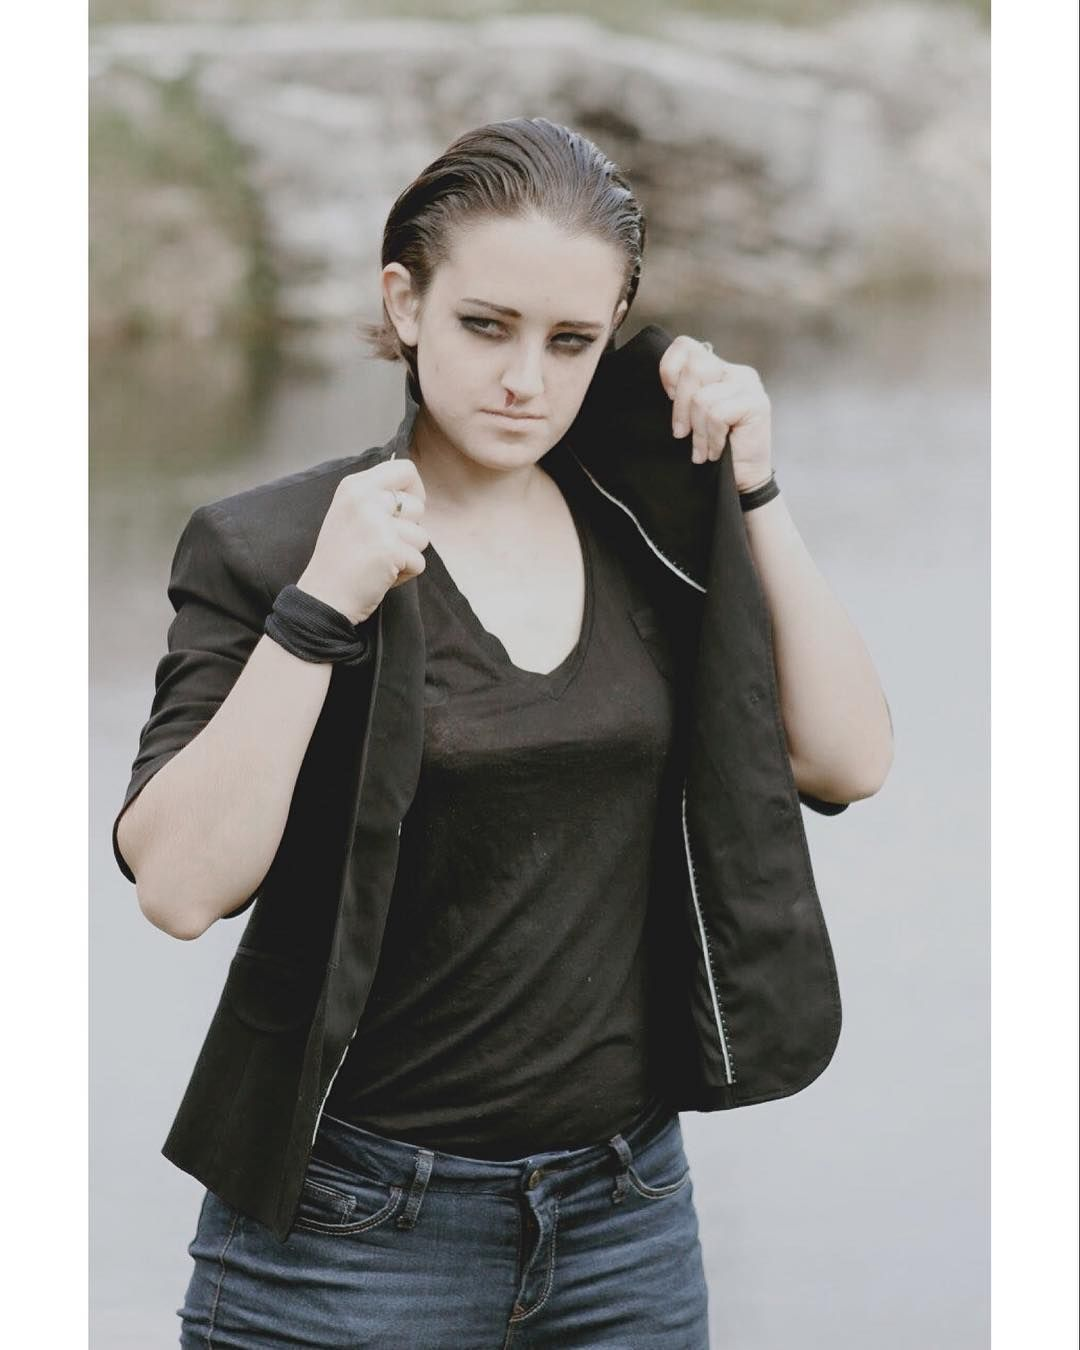 """I'm just curious why all of a sudden you look like some kind of MTV punk."" . . . #cosplay #cosplayer #cosplays #cute #goals #costume #eleven #elevencosplay #punkeleven #strangerthings #strangerthingsseason2 #netflix #netflixoriginal #netflixoriginalseries #photo #milliebobbybrown #finnwolfhard #calebmclaughlin #gatenmatarazzo #joekeery #sadiesink #noahschnapp @netflix @strangerthingstv @officialstrangerthings_ @milliebobbybrown @finnwolfhardofficial @noahschnapp @dkharbour @uncle_jezzy…"